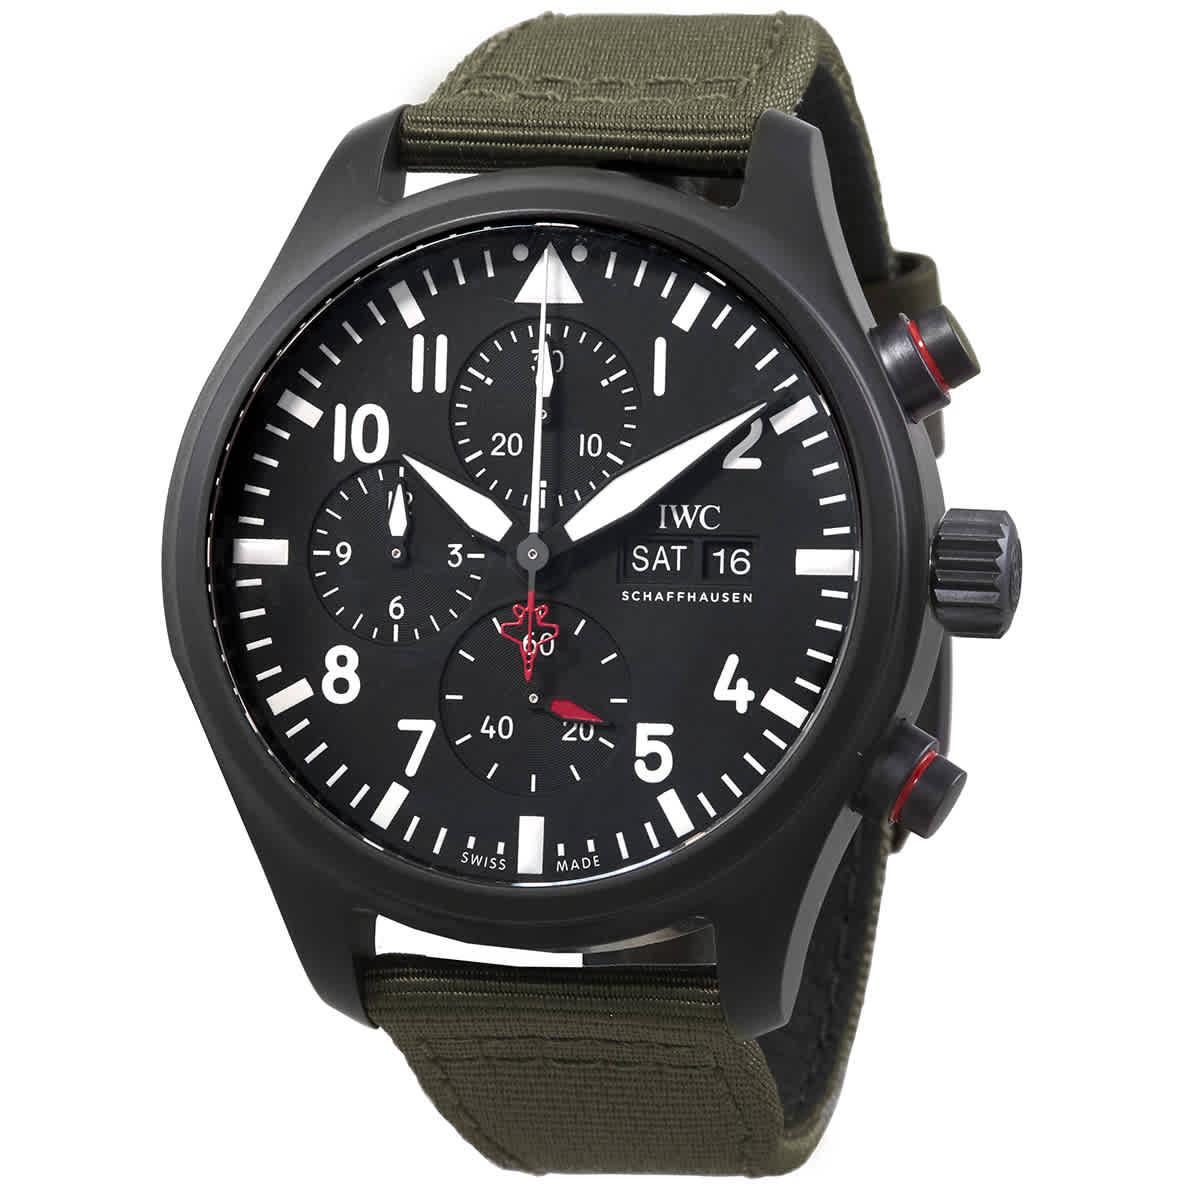 Iwc Schaffhausen Pilot Chronograph Top Gun ''sfti'' Automatic Mens Watch Iw389104 In Green